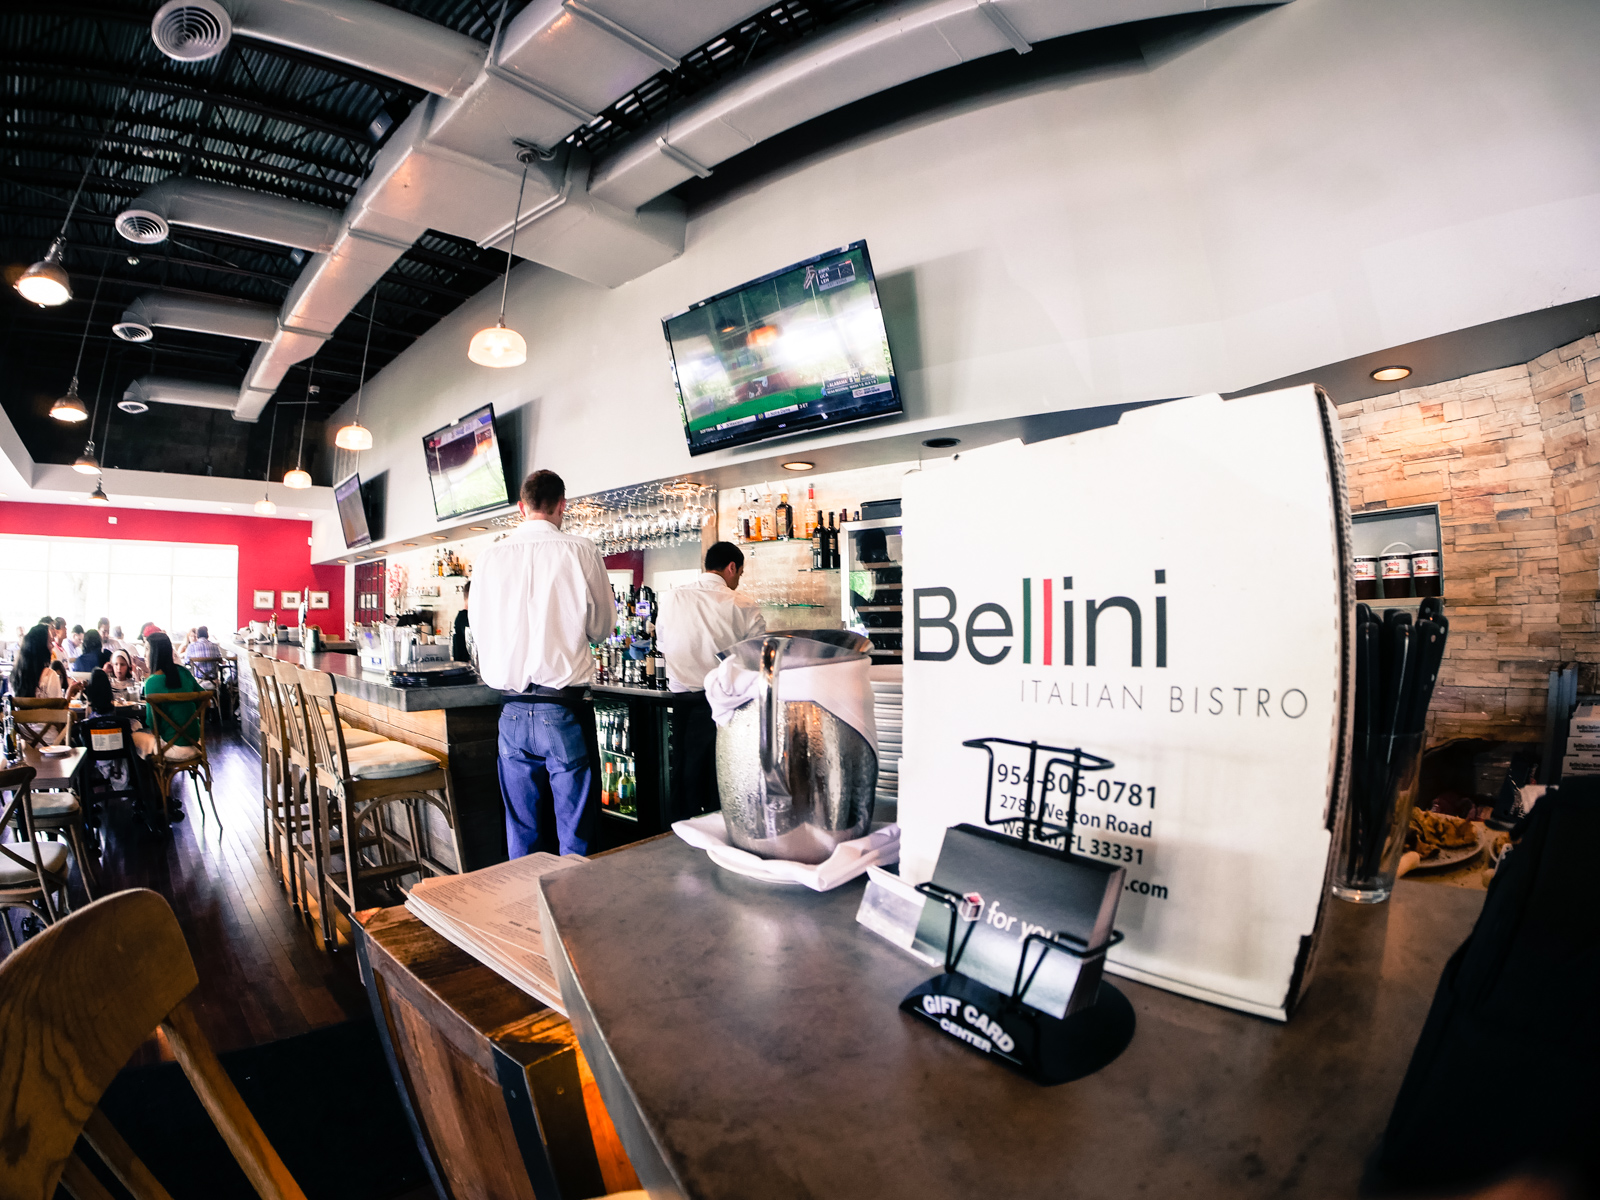 Bellini Italian Bistro Weston Restaurant